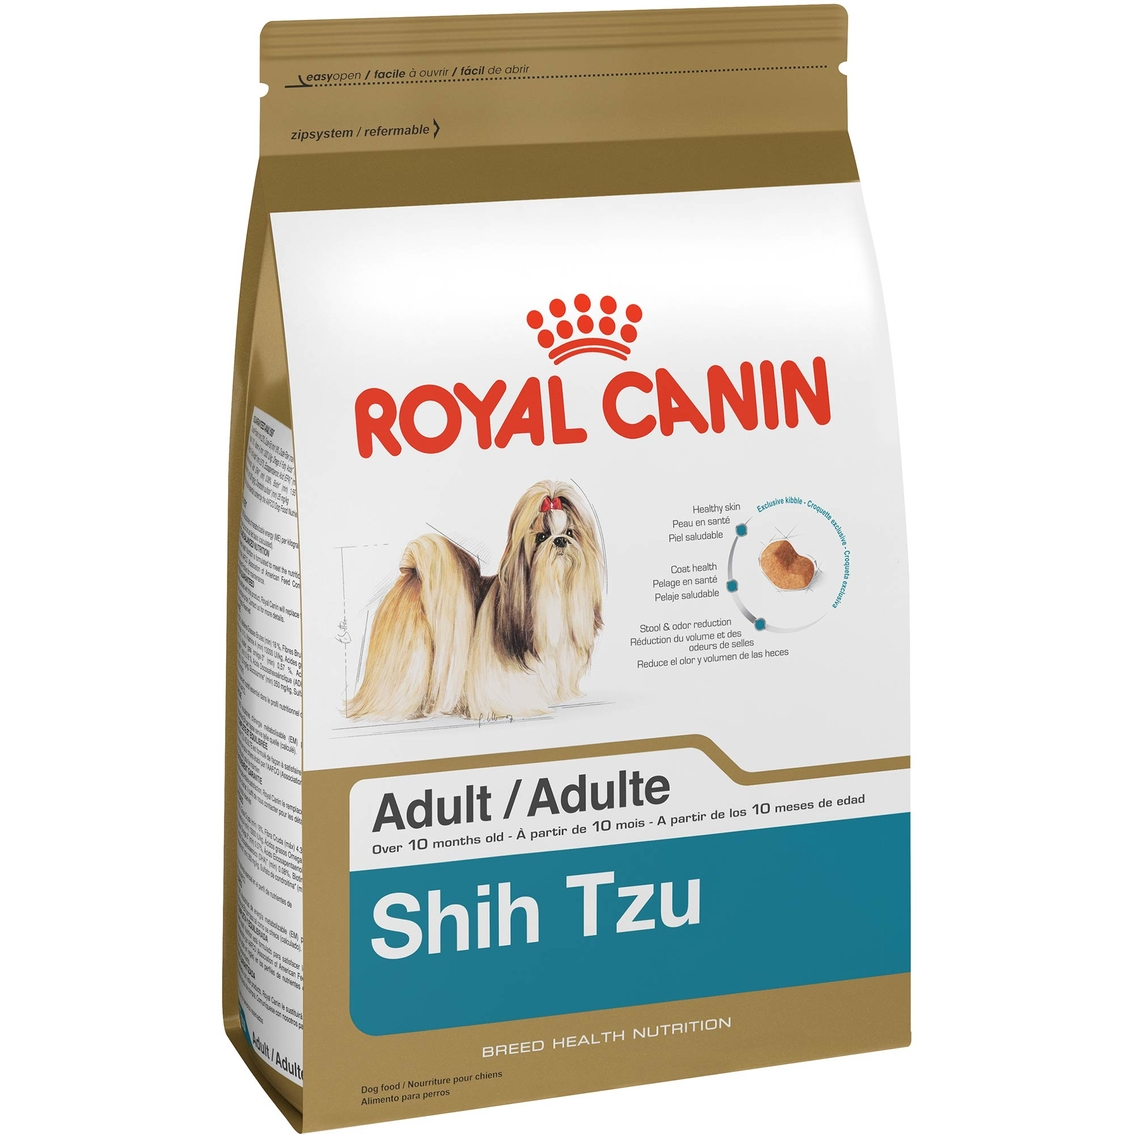 Royal Canin Breed Health Nutrition Shih Tzu Dry Dog Food Food Treats Household Shop The Exchange